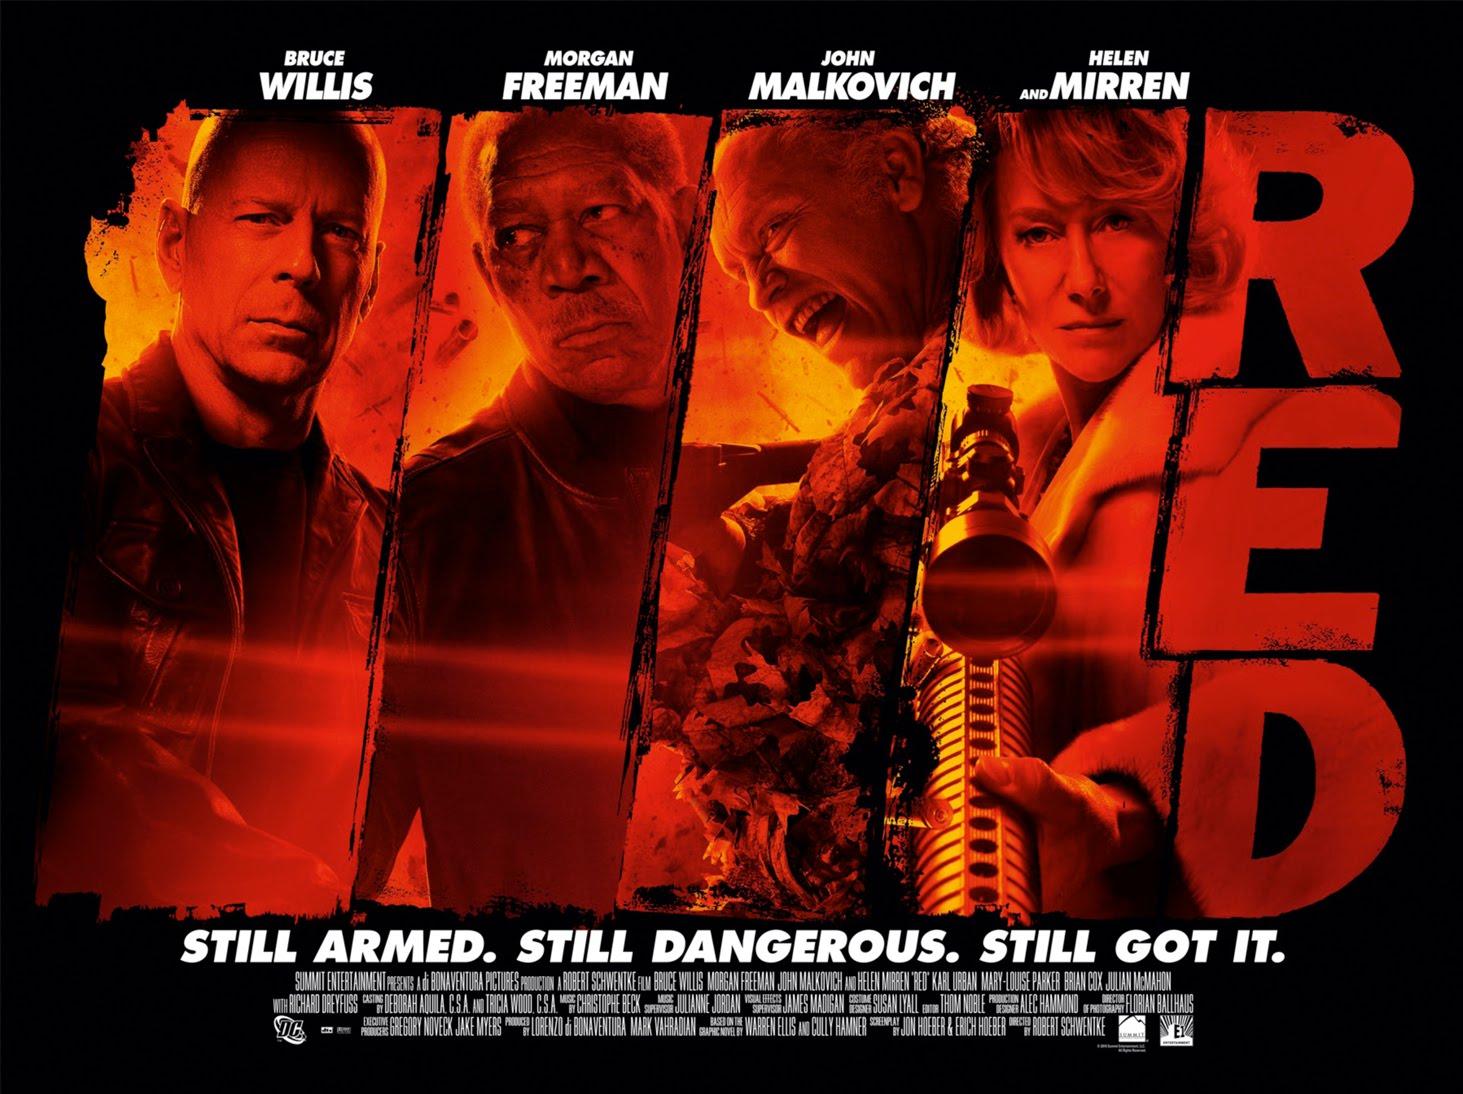 http://4.bp.blogspot.com/_XcFdwH4T64I/TKnwksW2TcI/AAAAAAAADew/ZKUpH1gHmro/s1600/Red_Movie.jpg